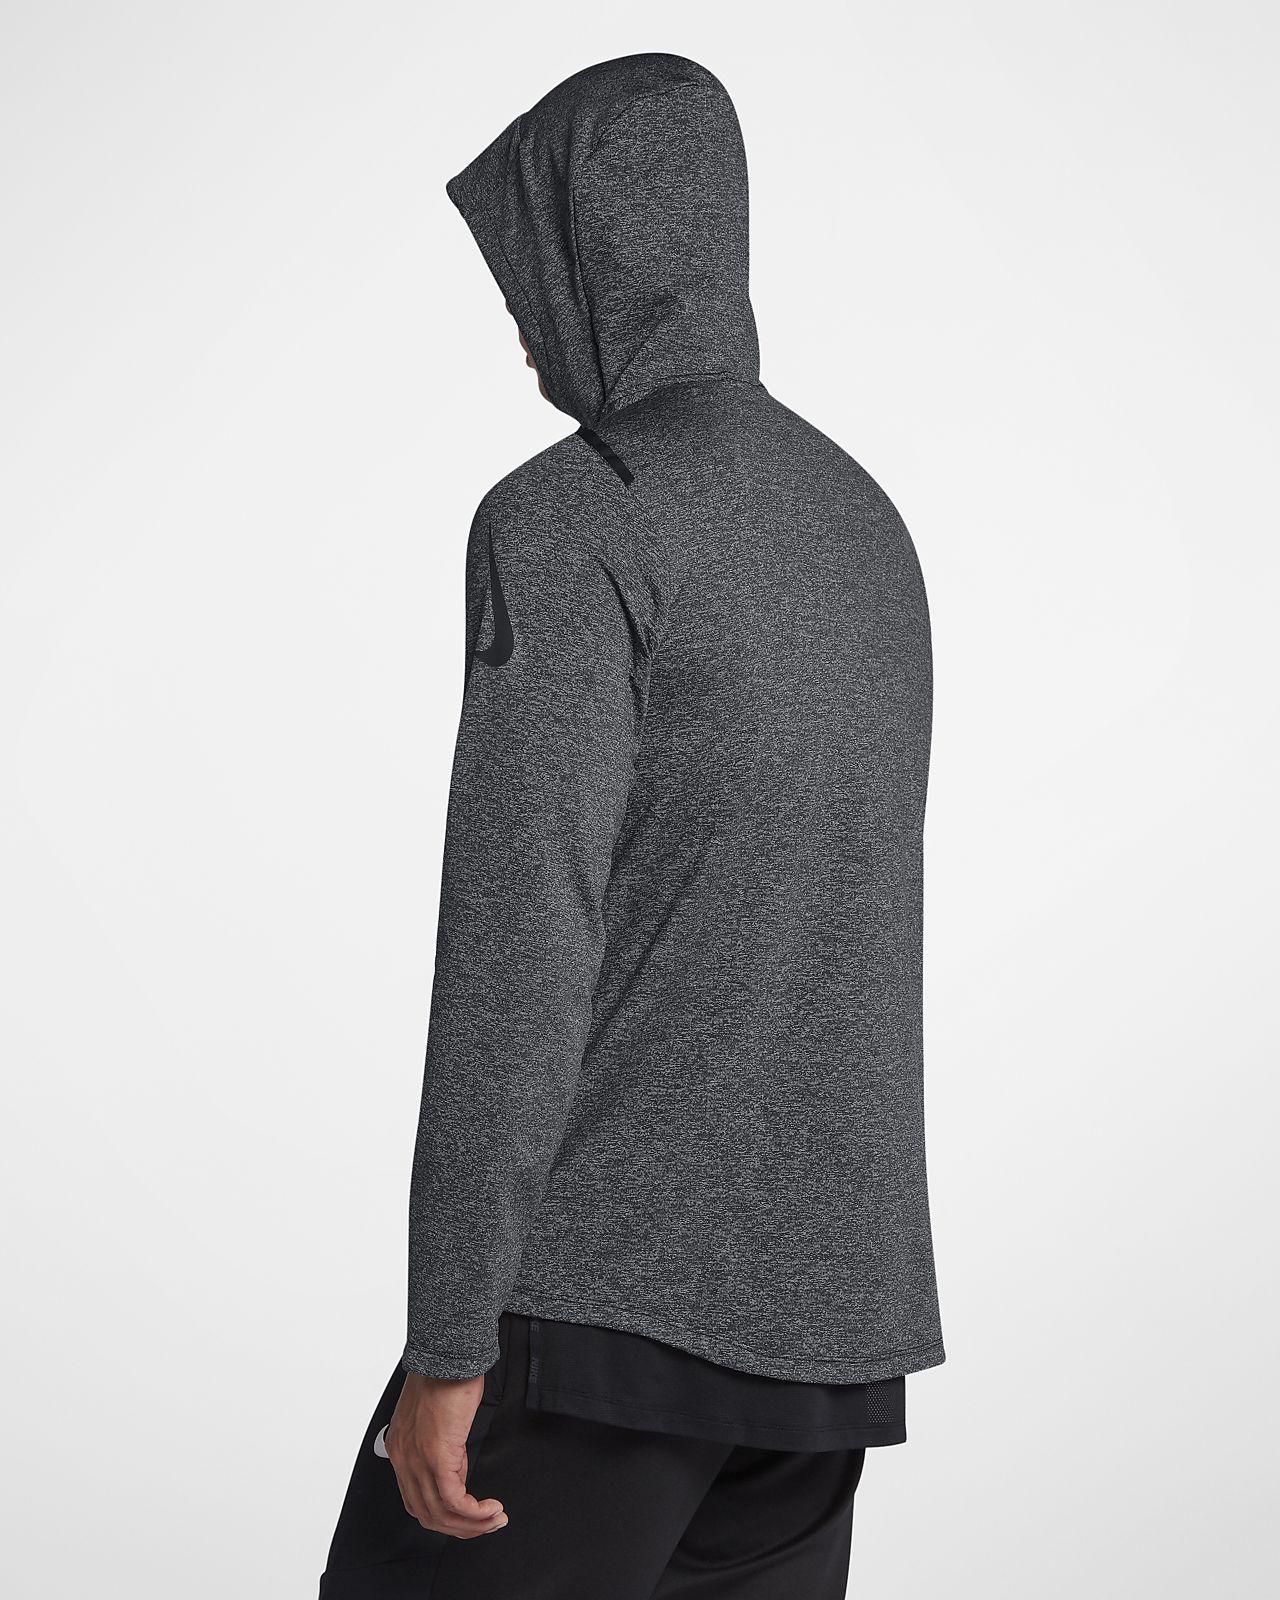 5de217bb Nike Dri-FIT Men's Long-Sleeve Full-Zip Training Hoodie. Nike.com GB